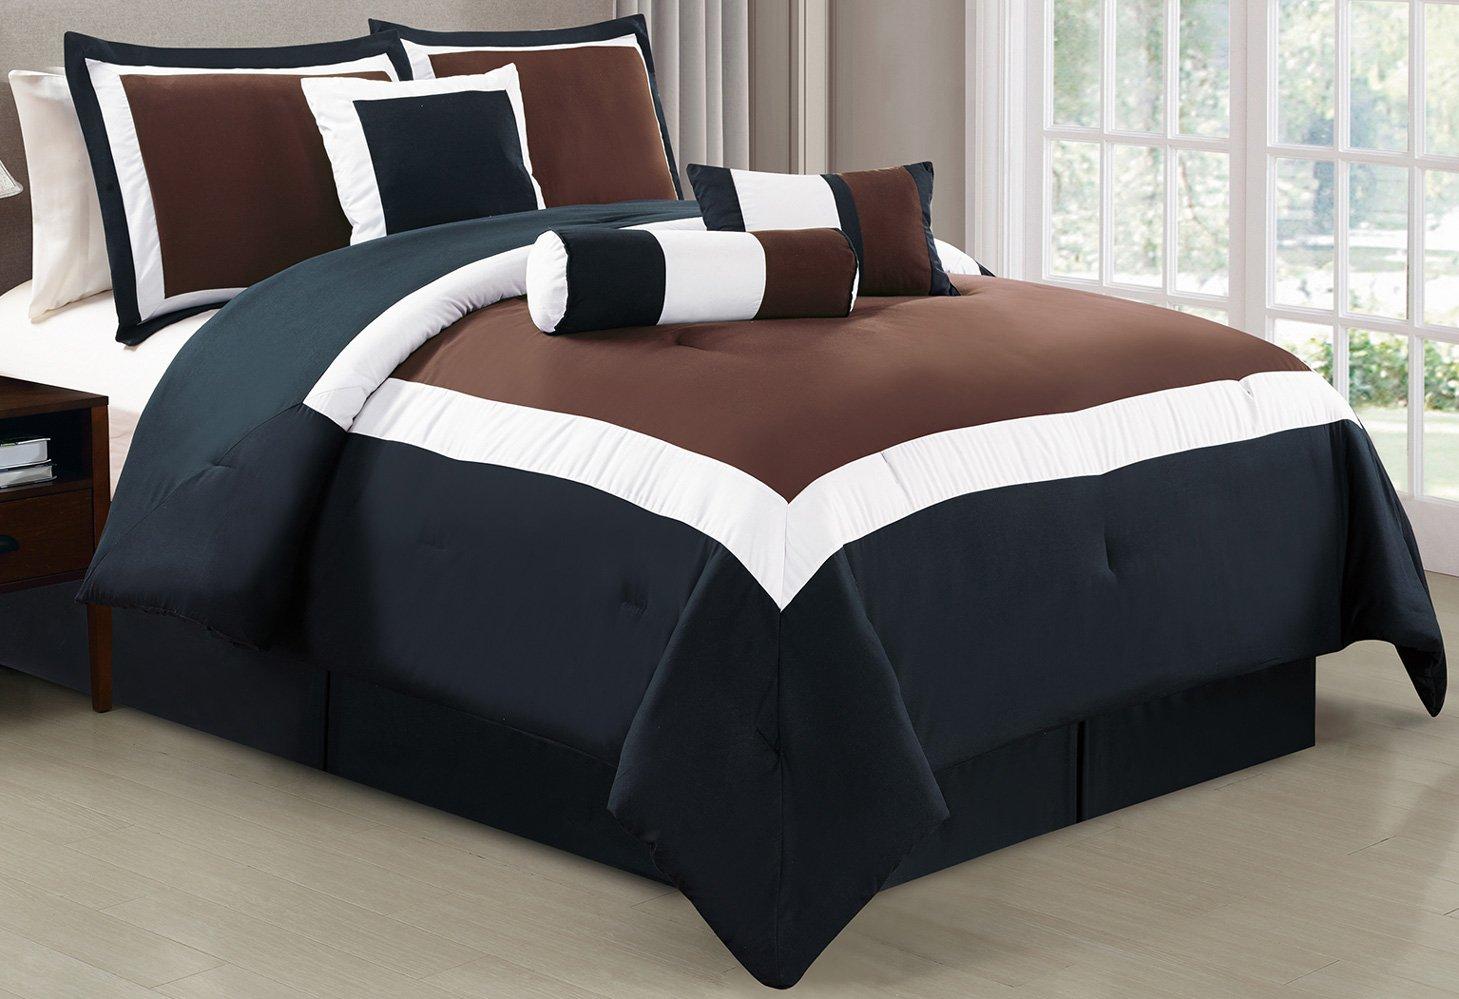 Grand Linen 7 Piece Oversize BROWN/BLACK/WHITE Color Block Comforter set 90'' X 88'' Full Size Bedding